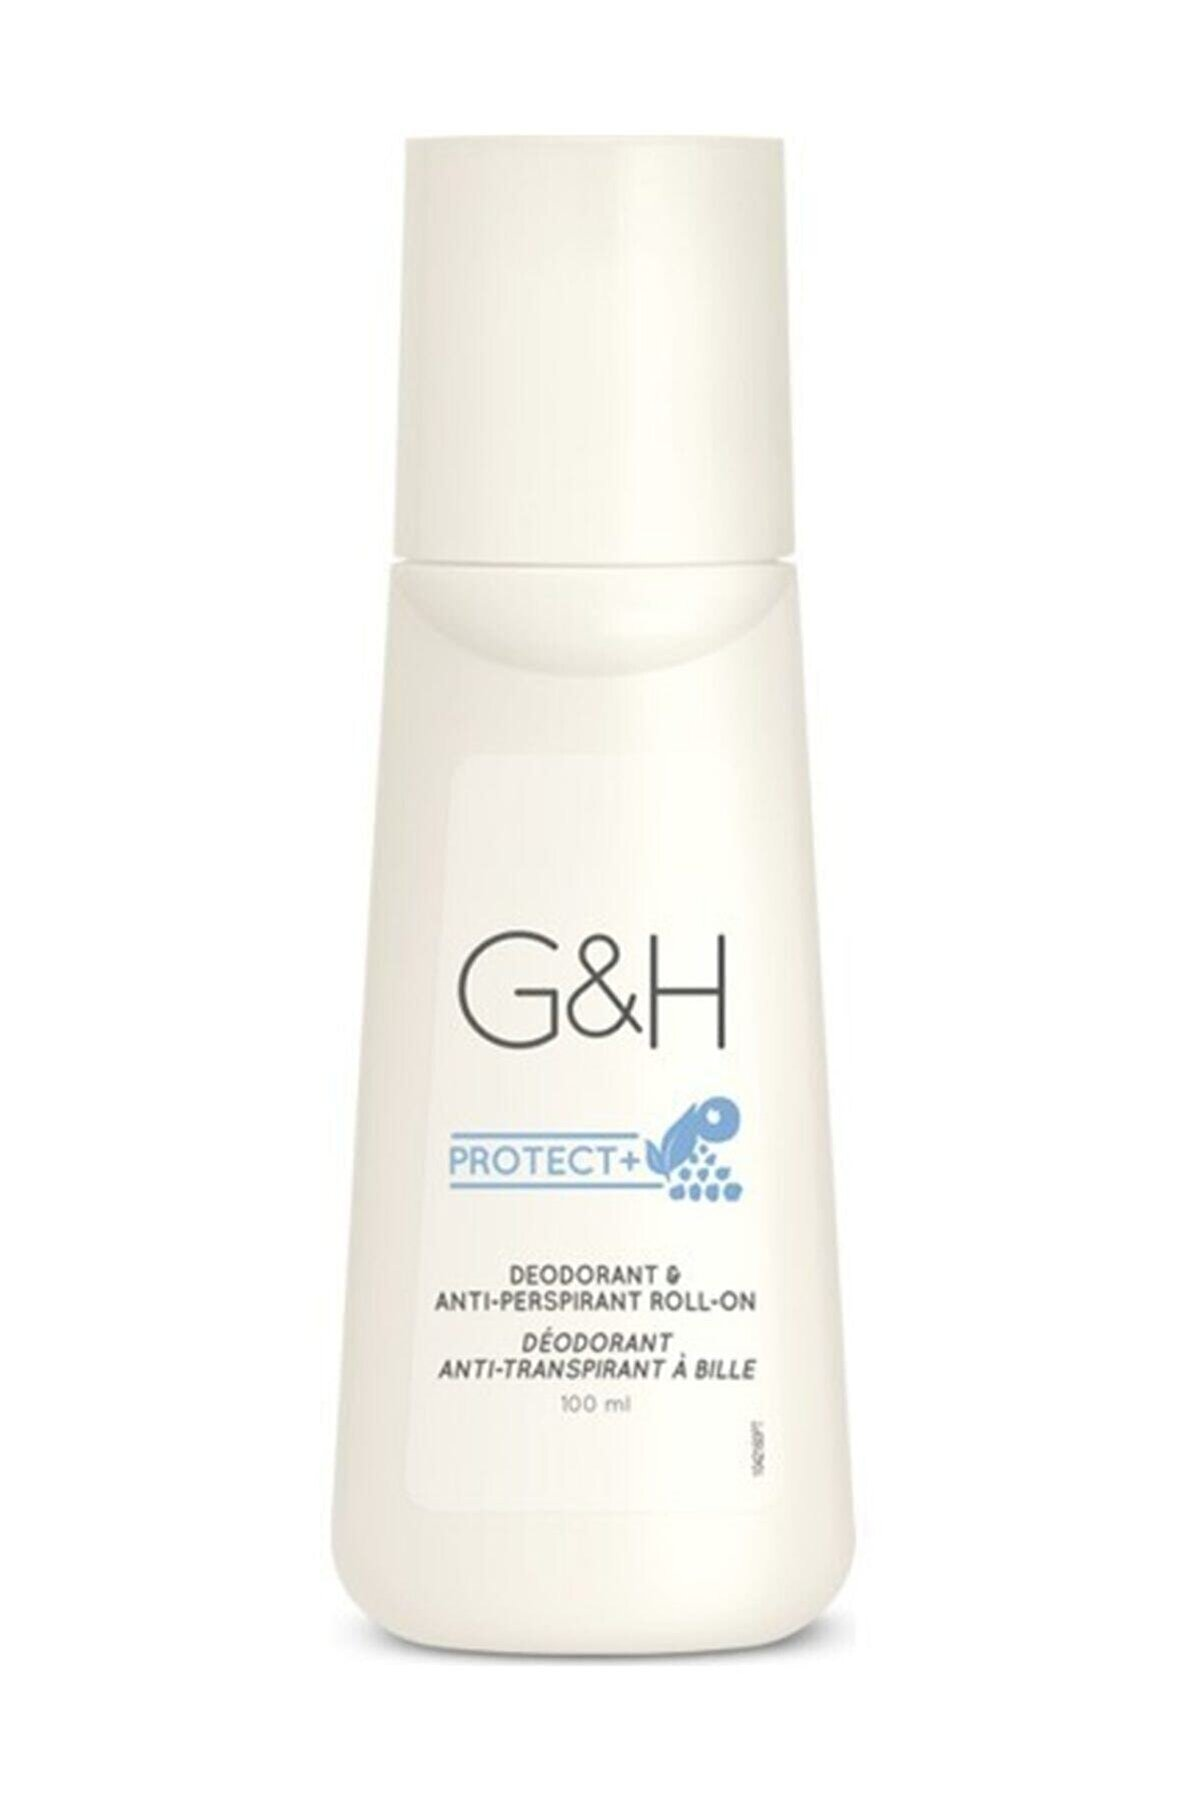 Amway G&h Protect Terlemeye Karşı/koku Giderici Roll-on Deodorant